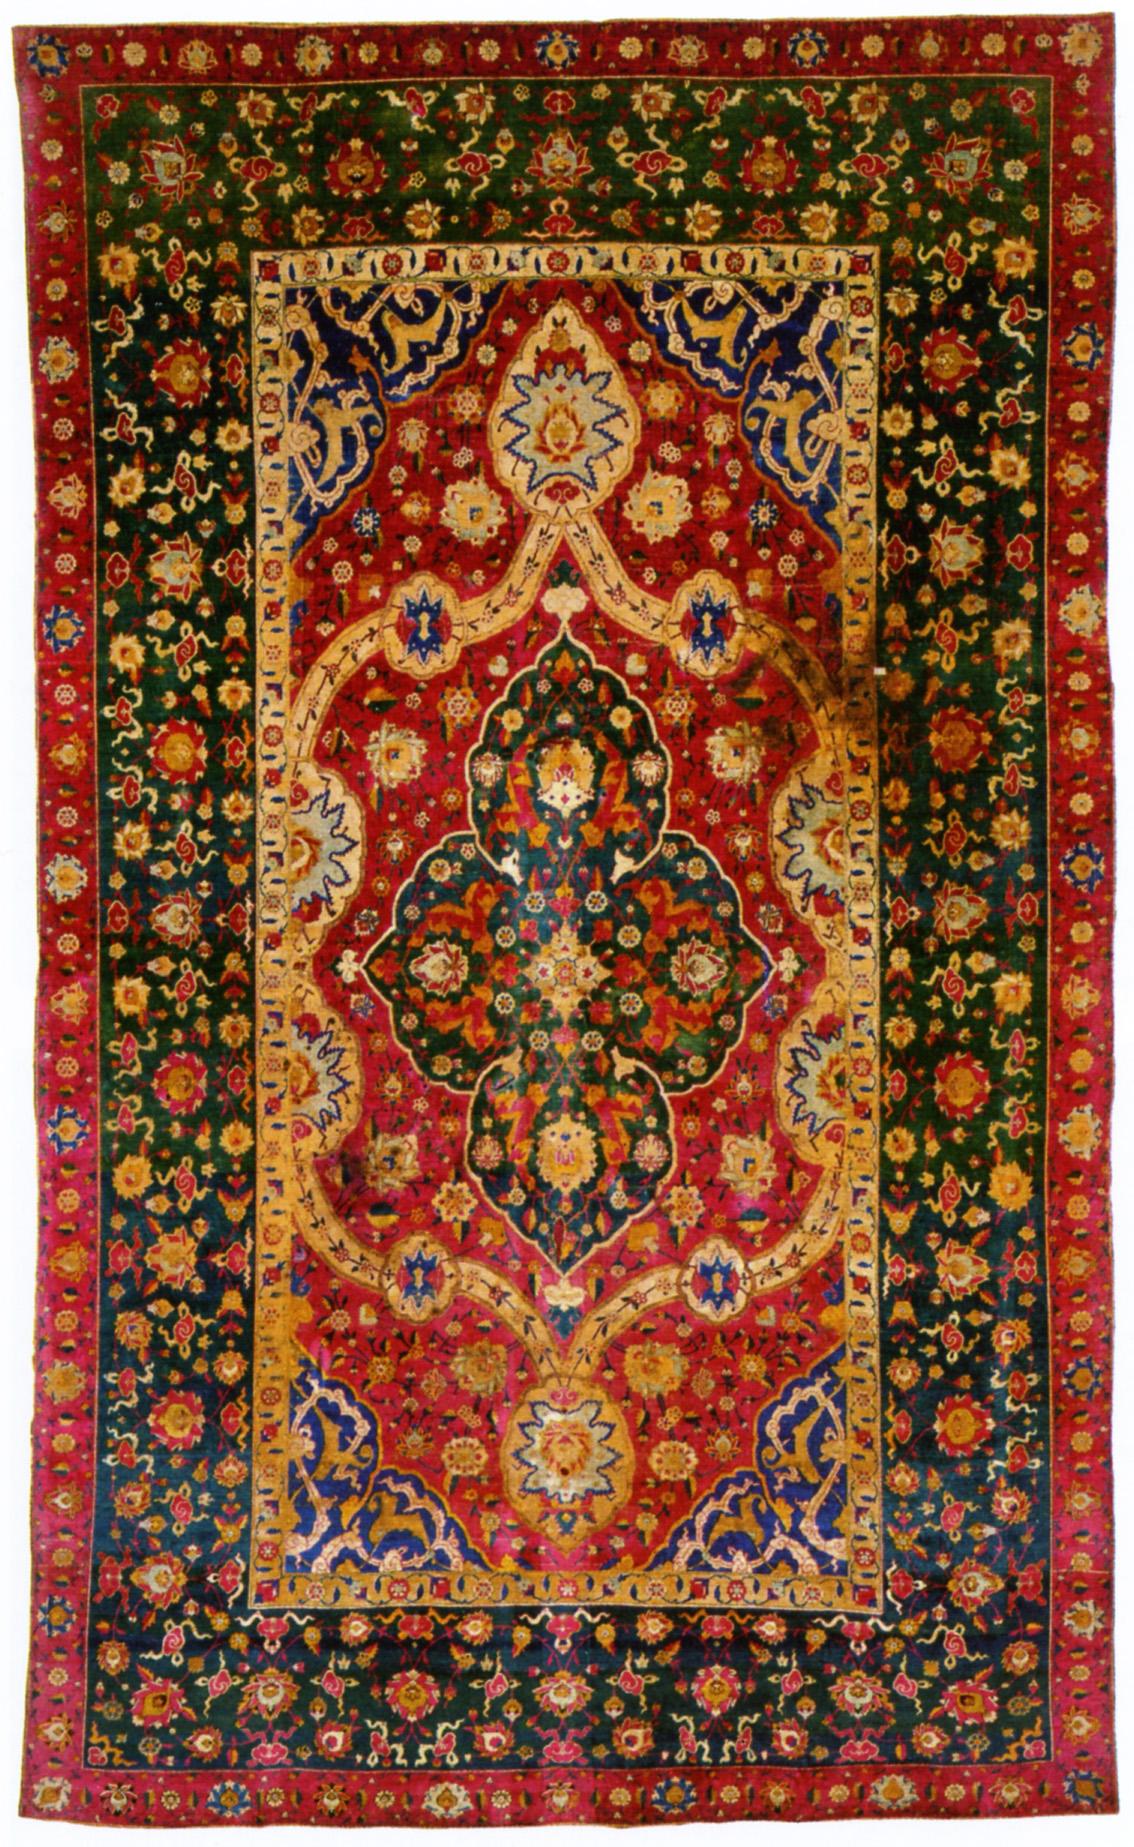 Tapete wikipedia la enciclopedia libre for Tipos de alfombras